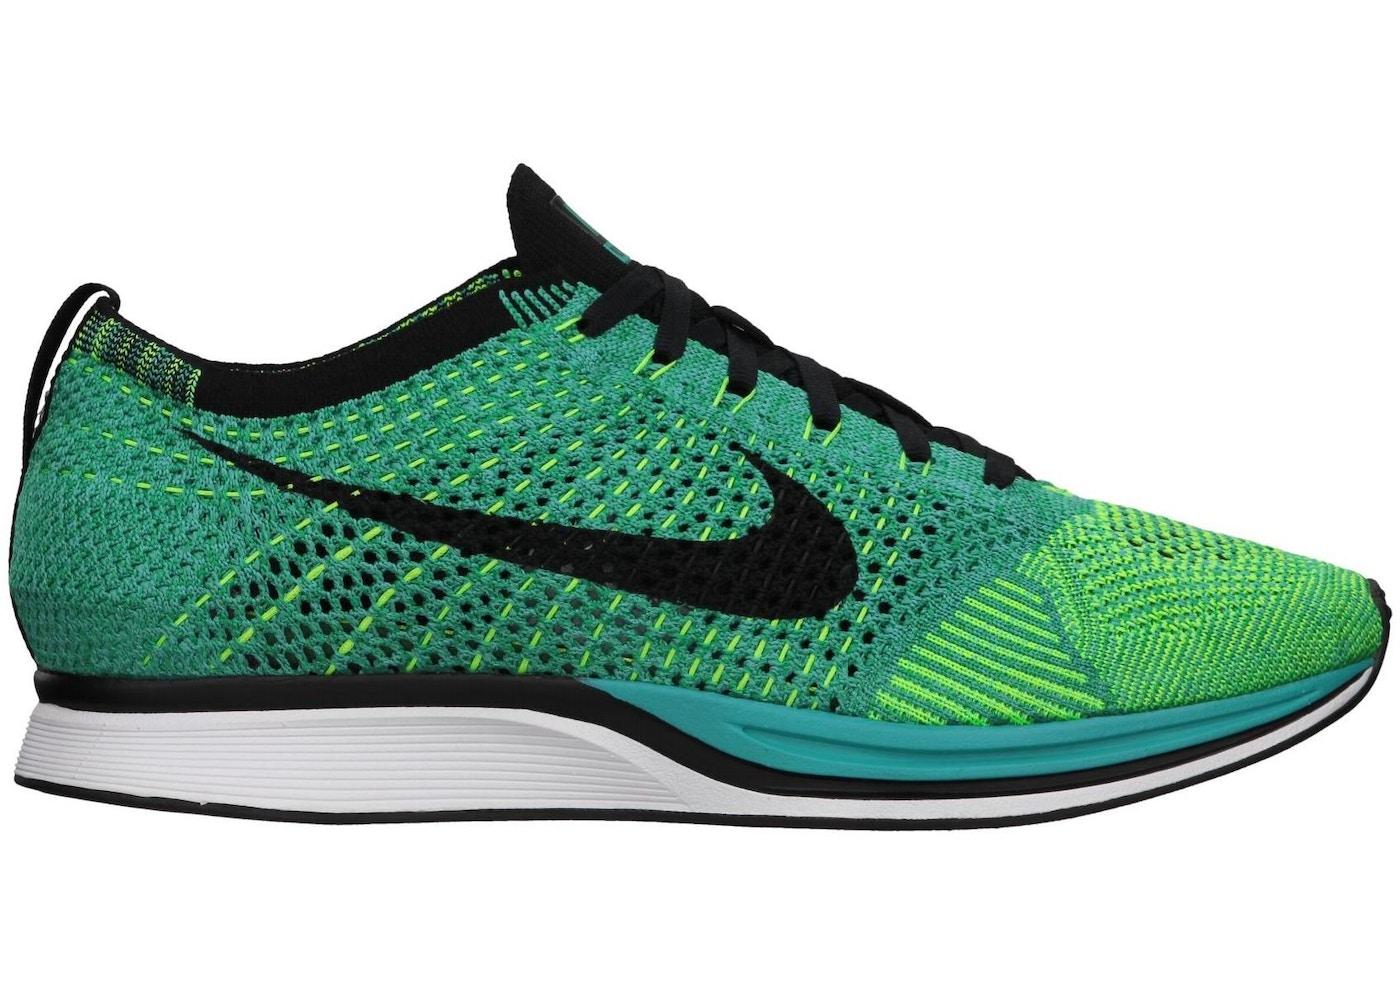 online store 0cc14 7b46d Nike Flyknit Racer Sport Turquoise Lucid Green - 526628-300